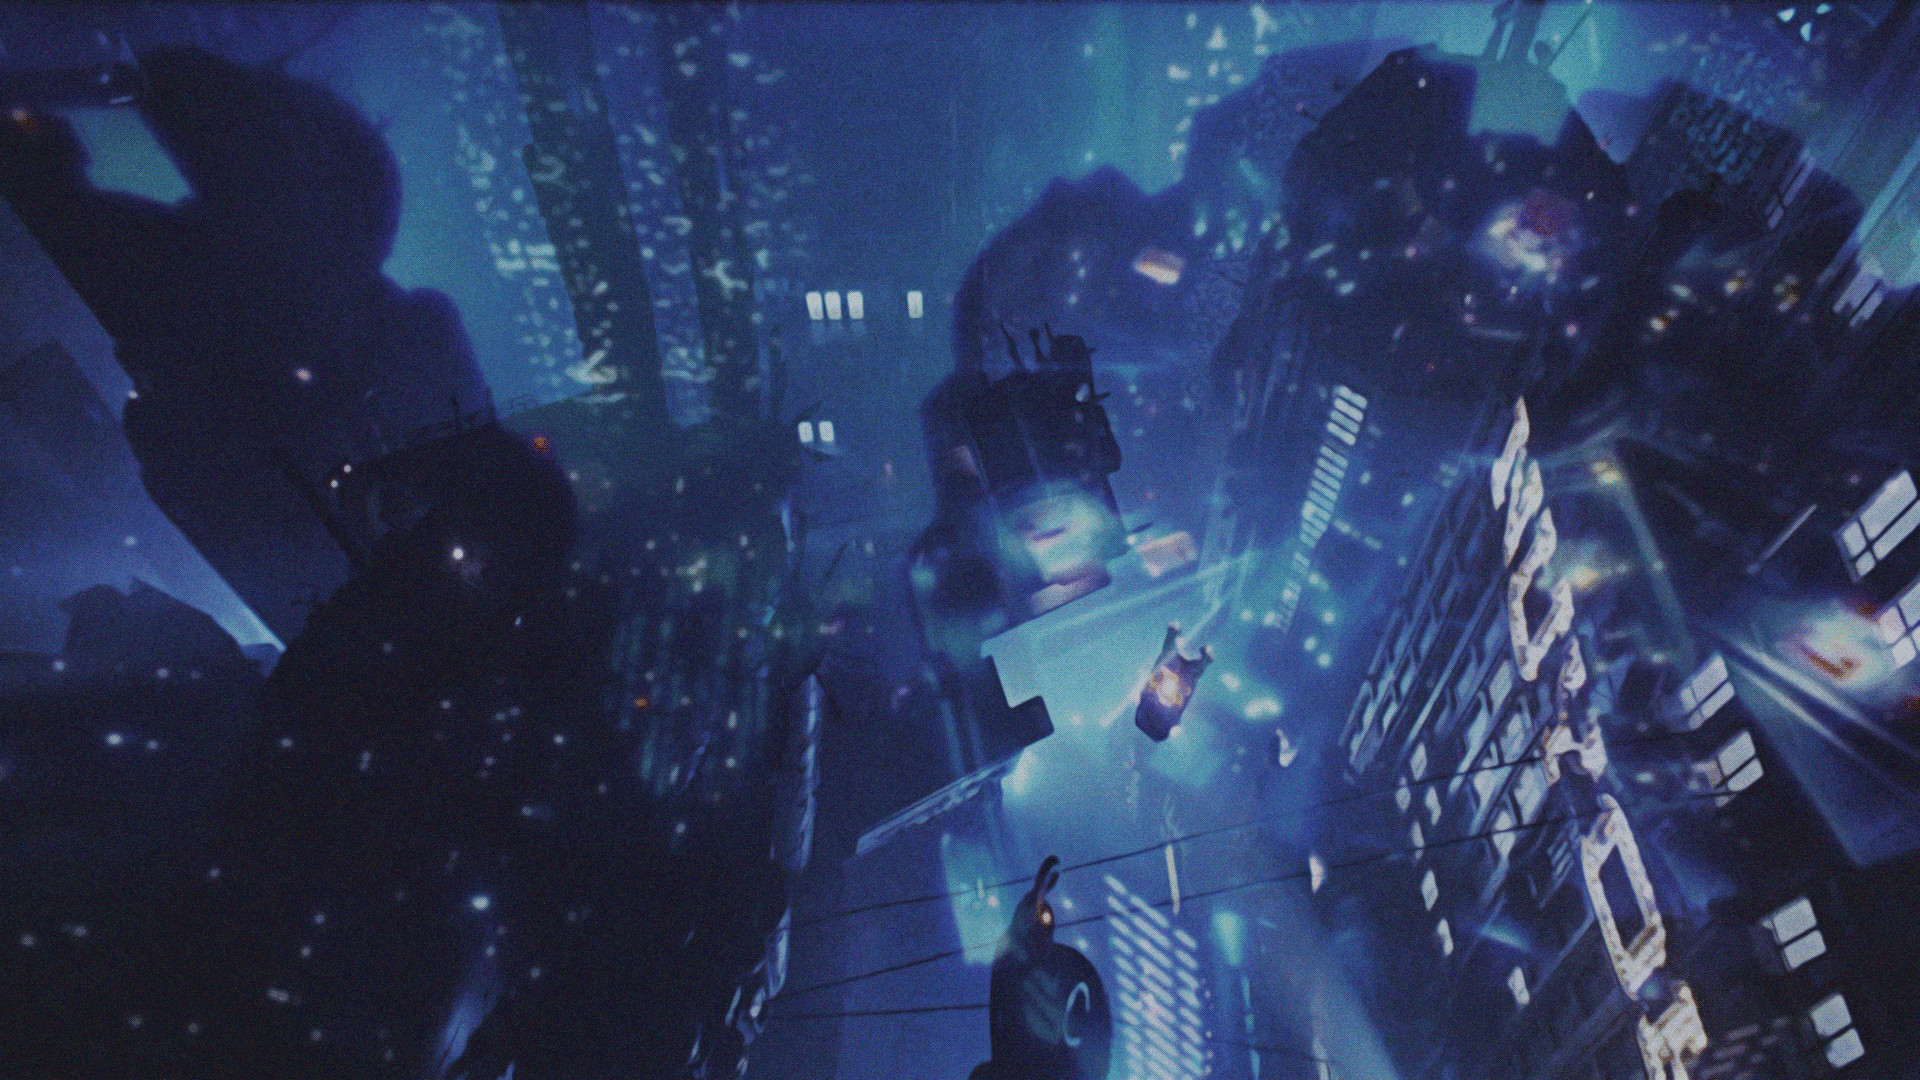 Blade Runner Movie Wallpapers | WallpapersIn4k.net